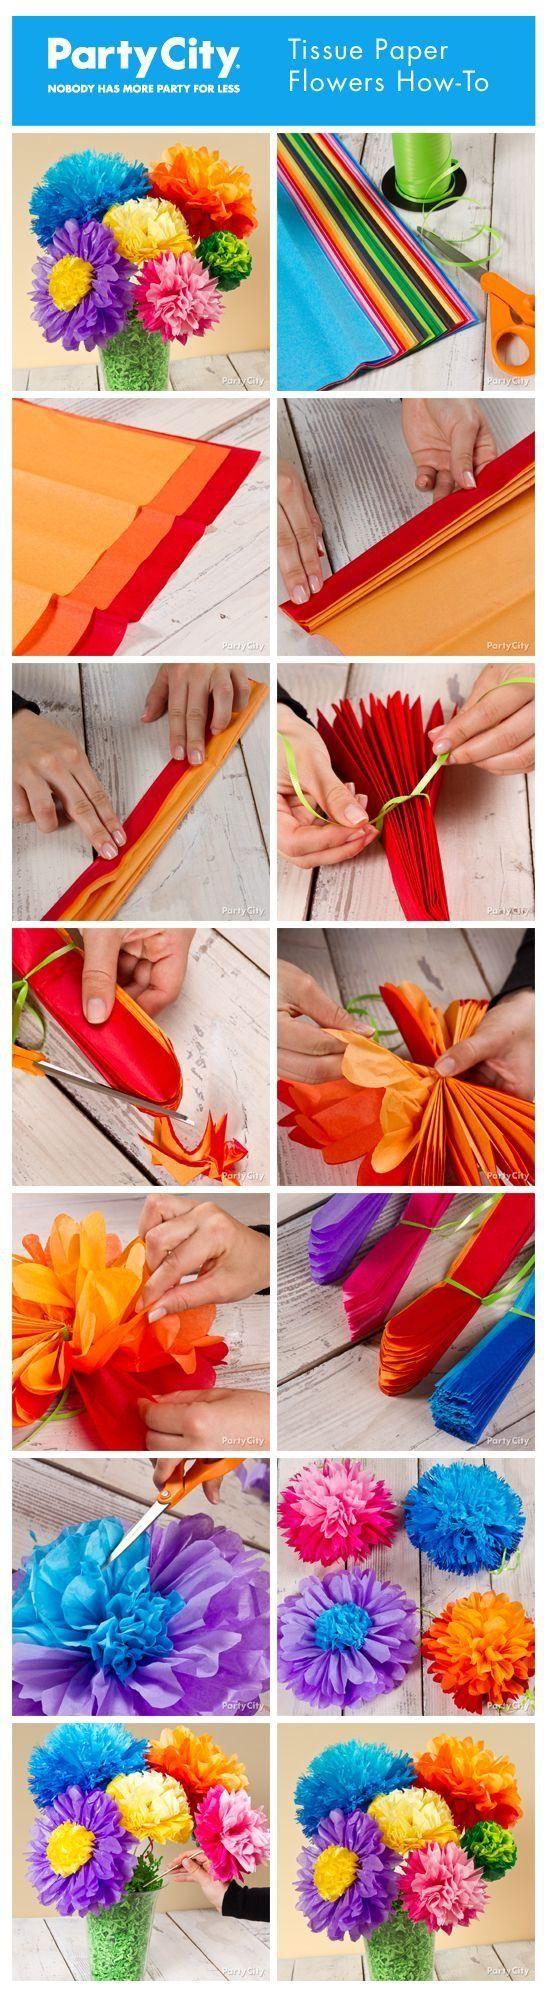 35 best paper art easy images on pinterest paper crafts and diy tissue paper flowers for back drop dhlflorist Images